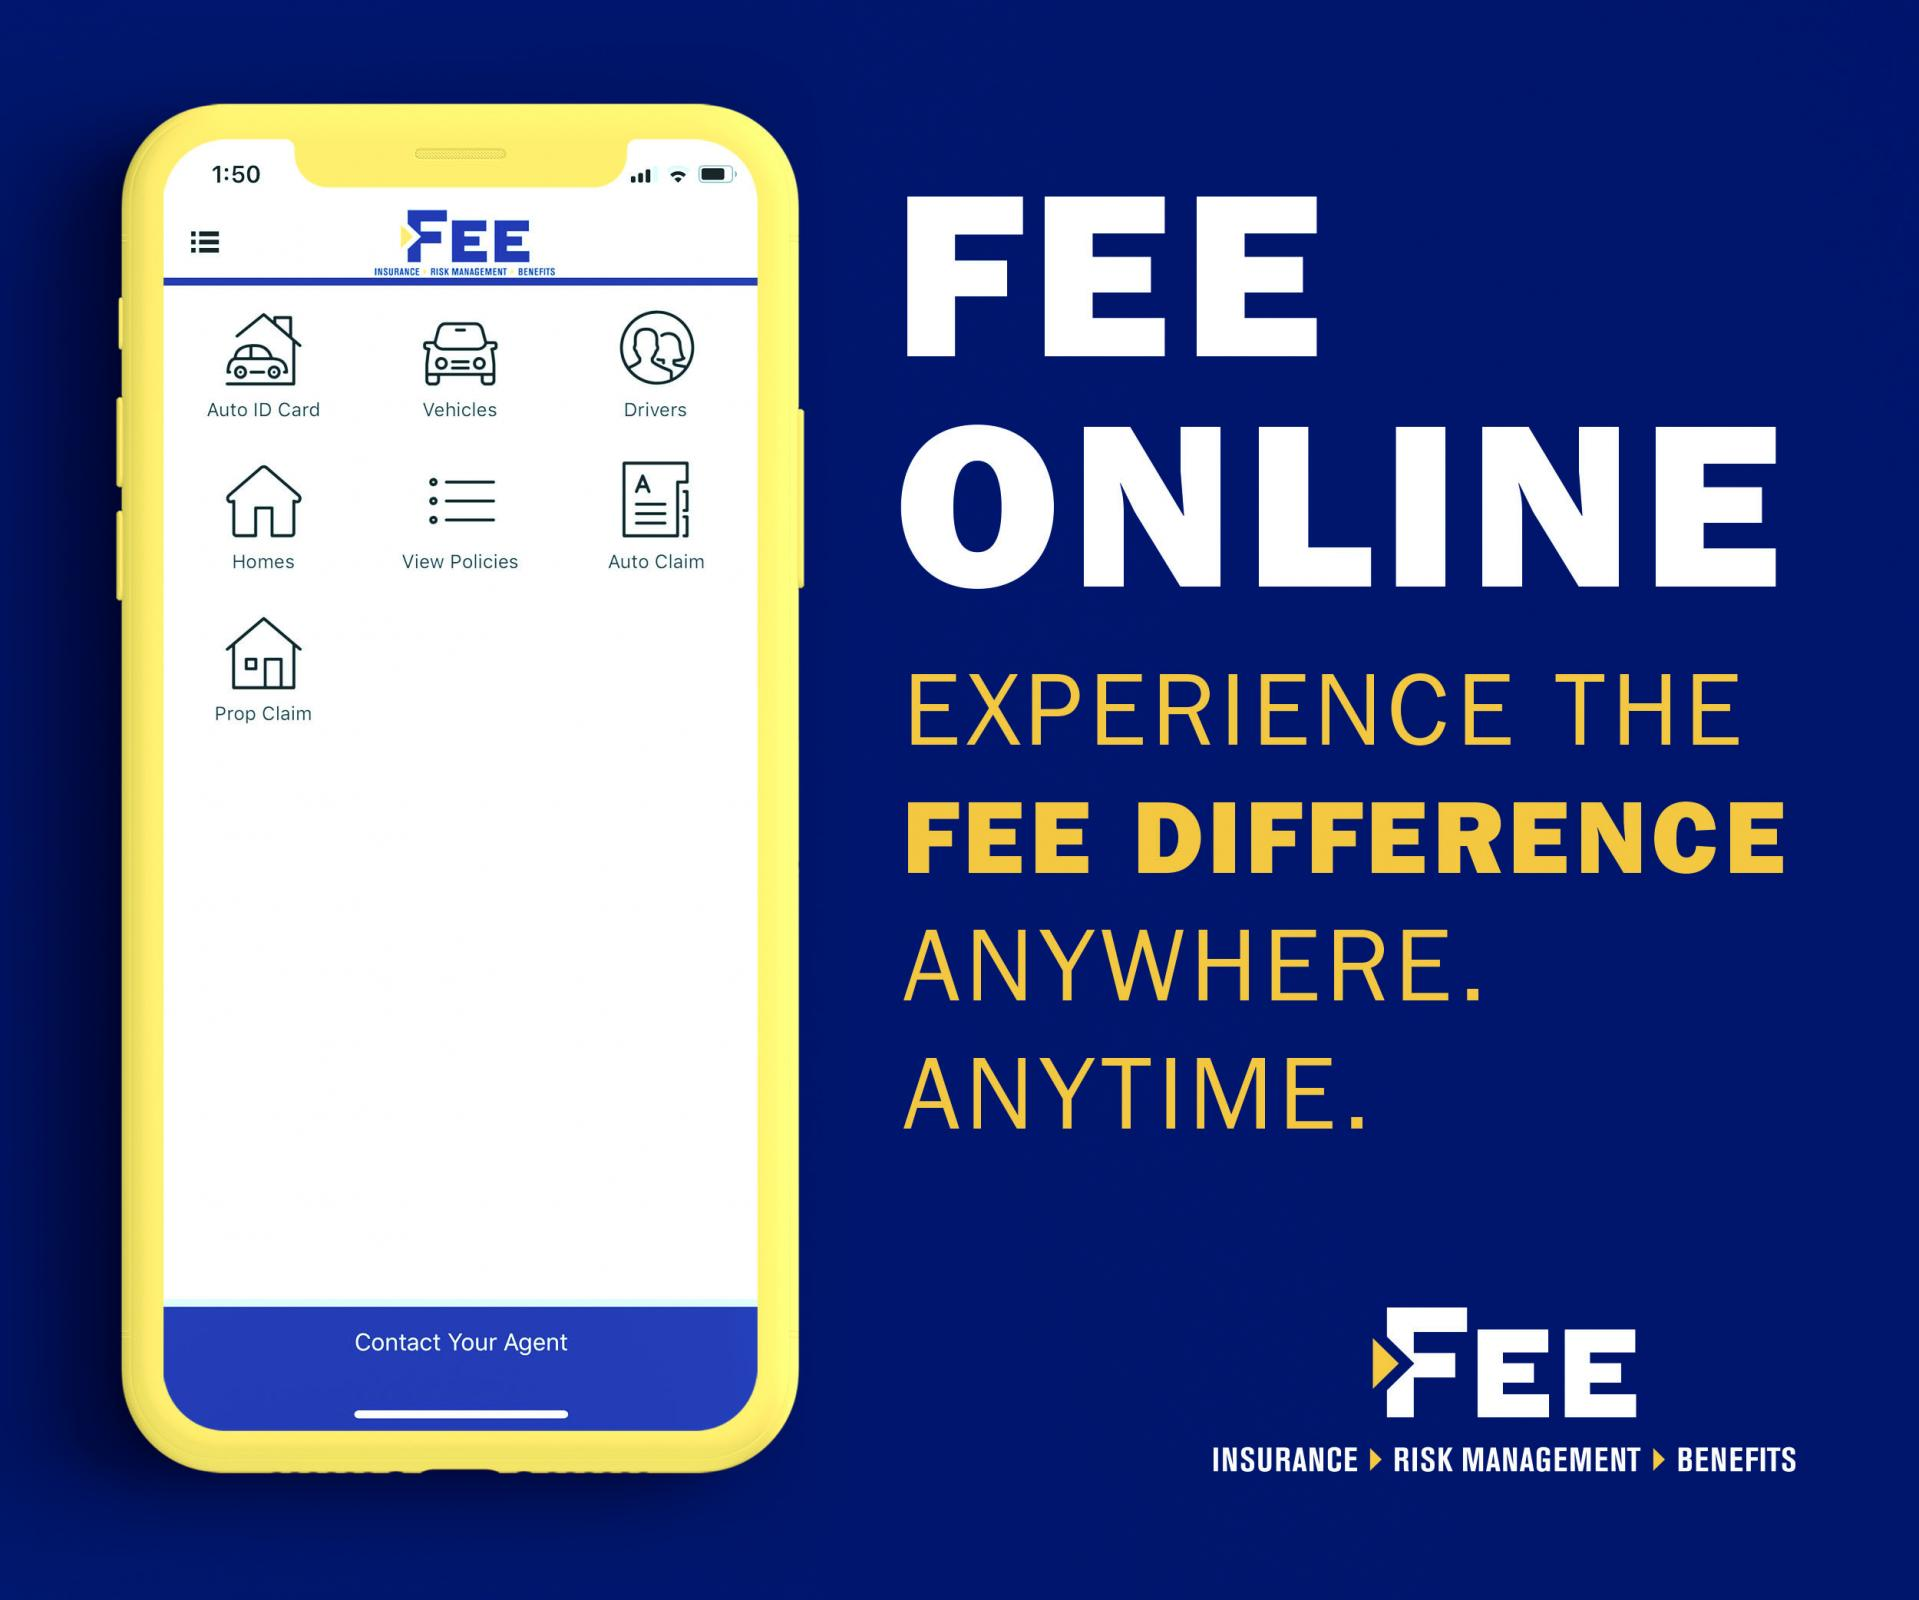 fee_ad